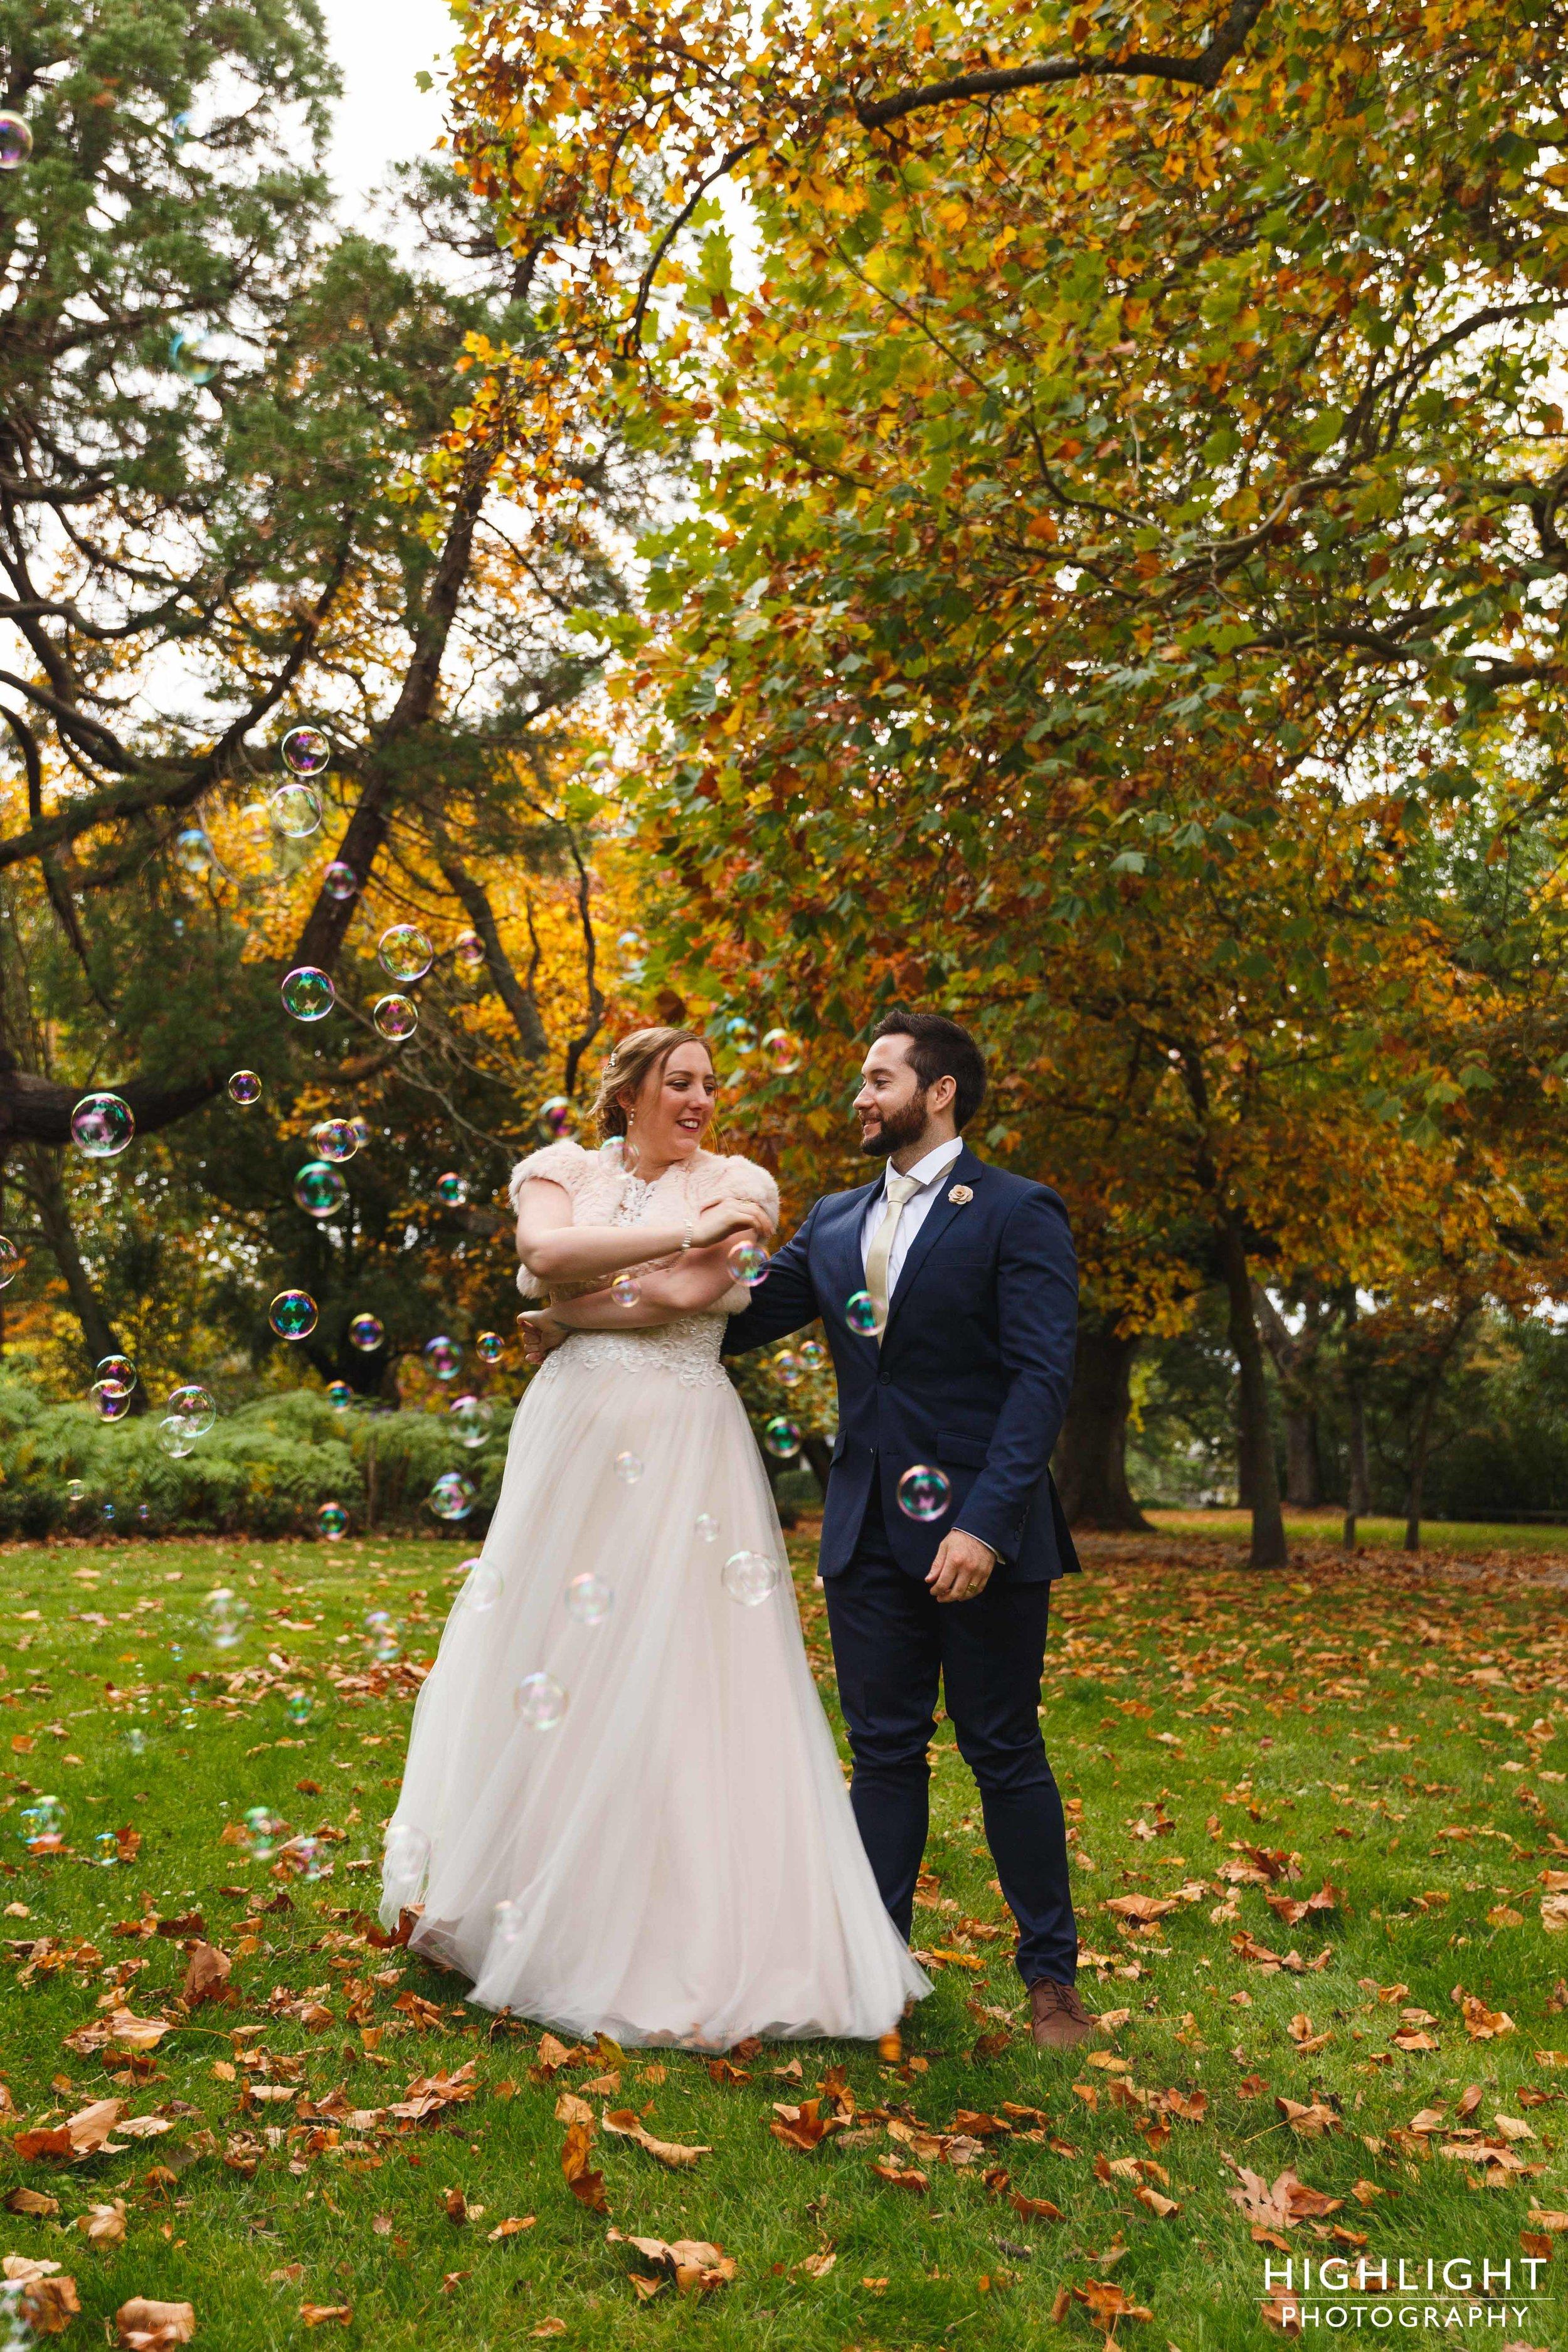 highlight-wedding-photography-palmerston-north-new-zealand-manawatu-chalet-81.jpg